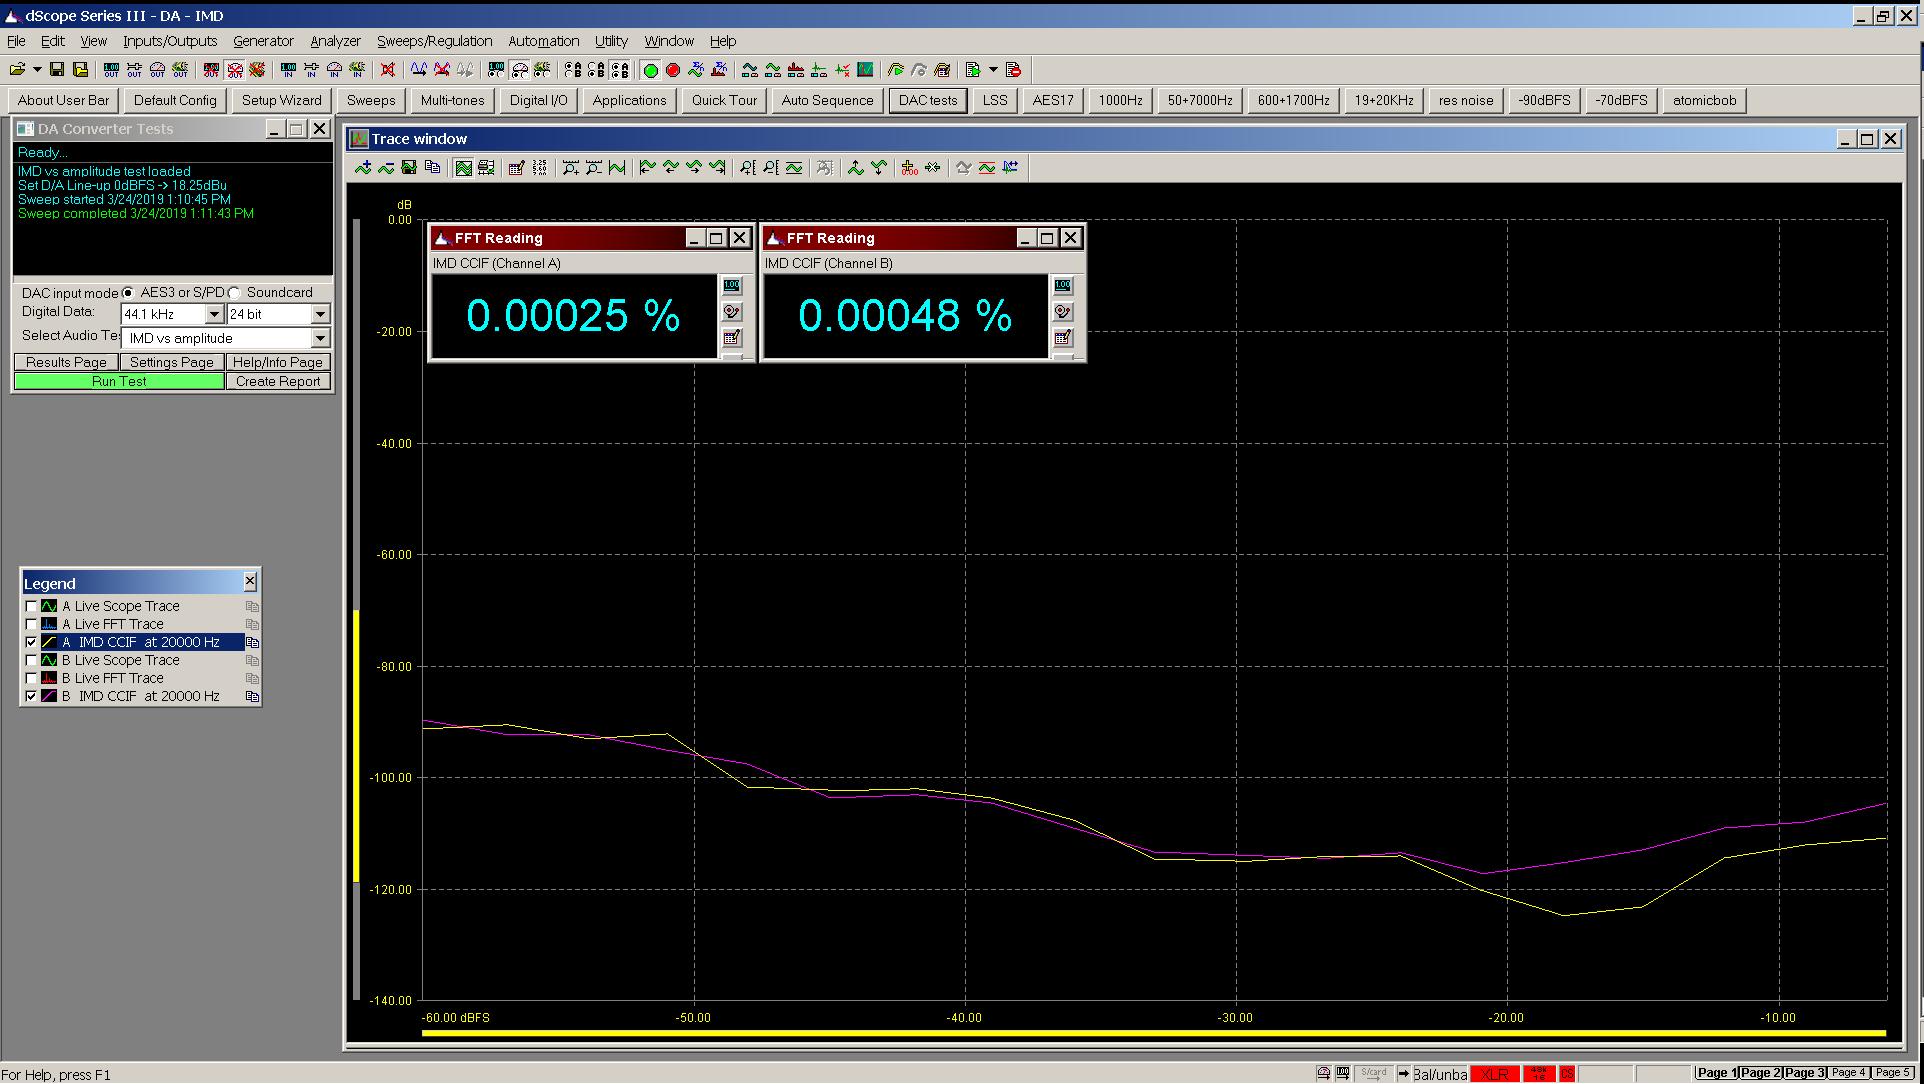 20190323-05 solaris Bal IMD vs amplitude - AES.PNG